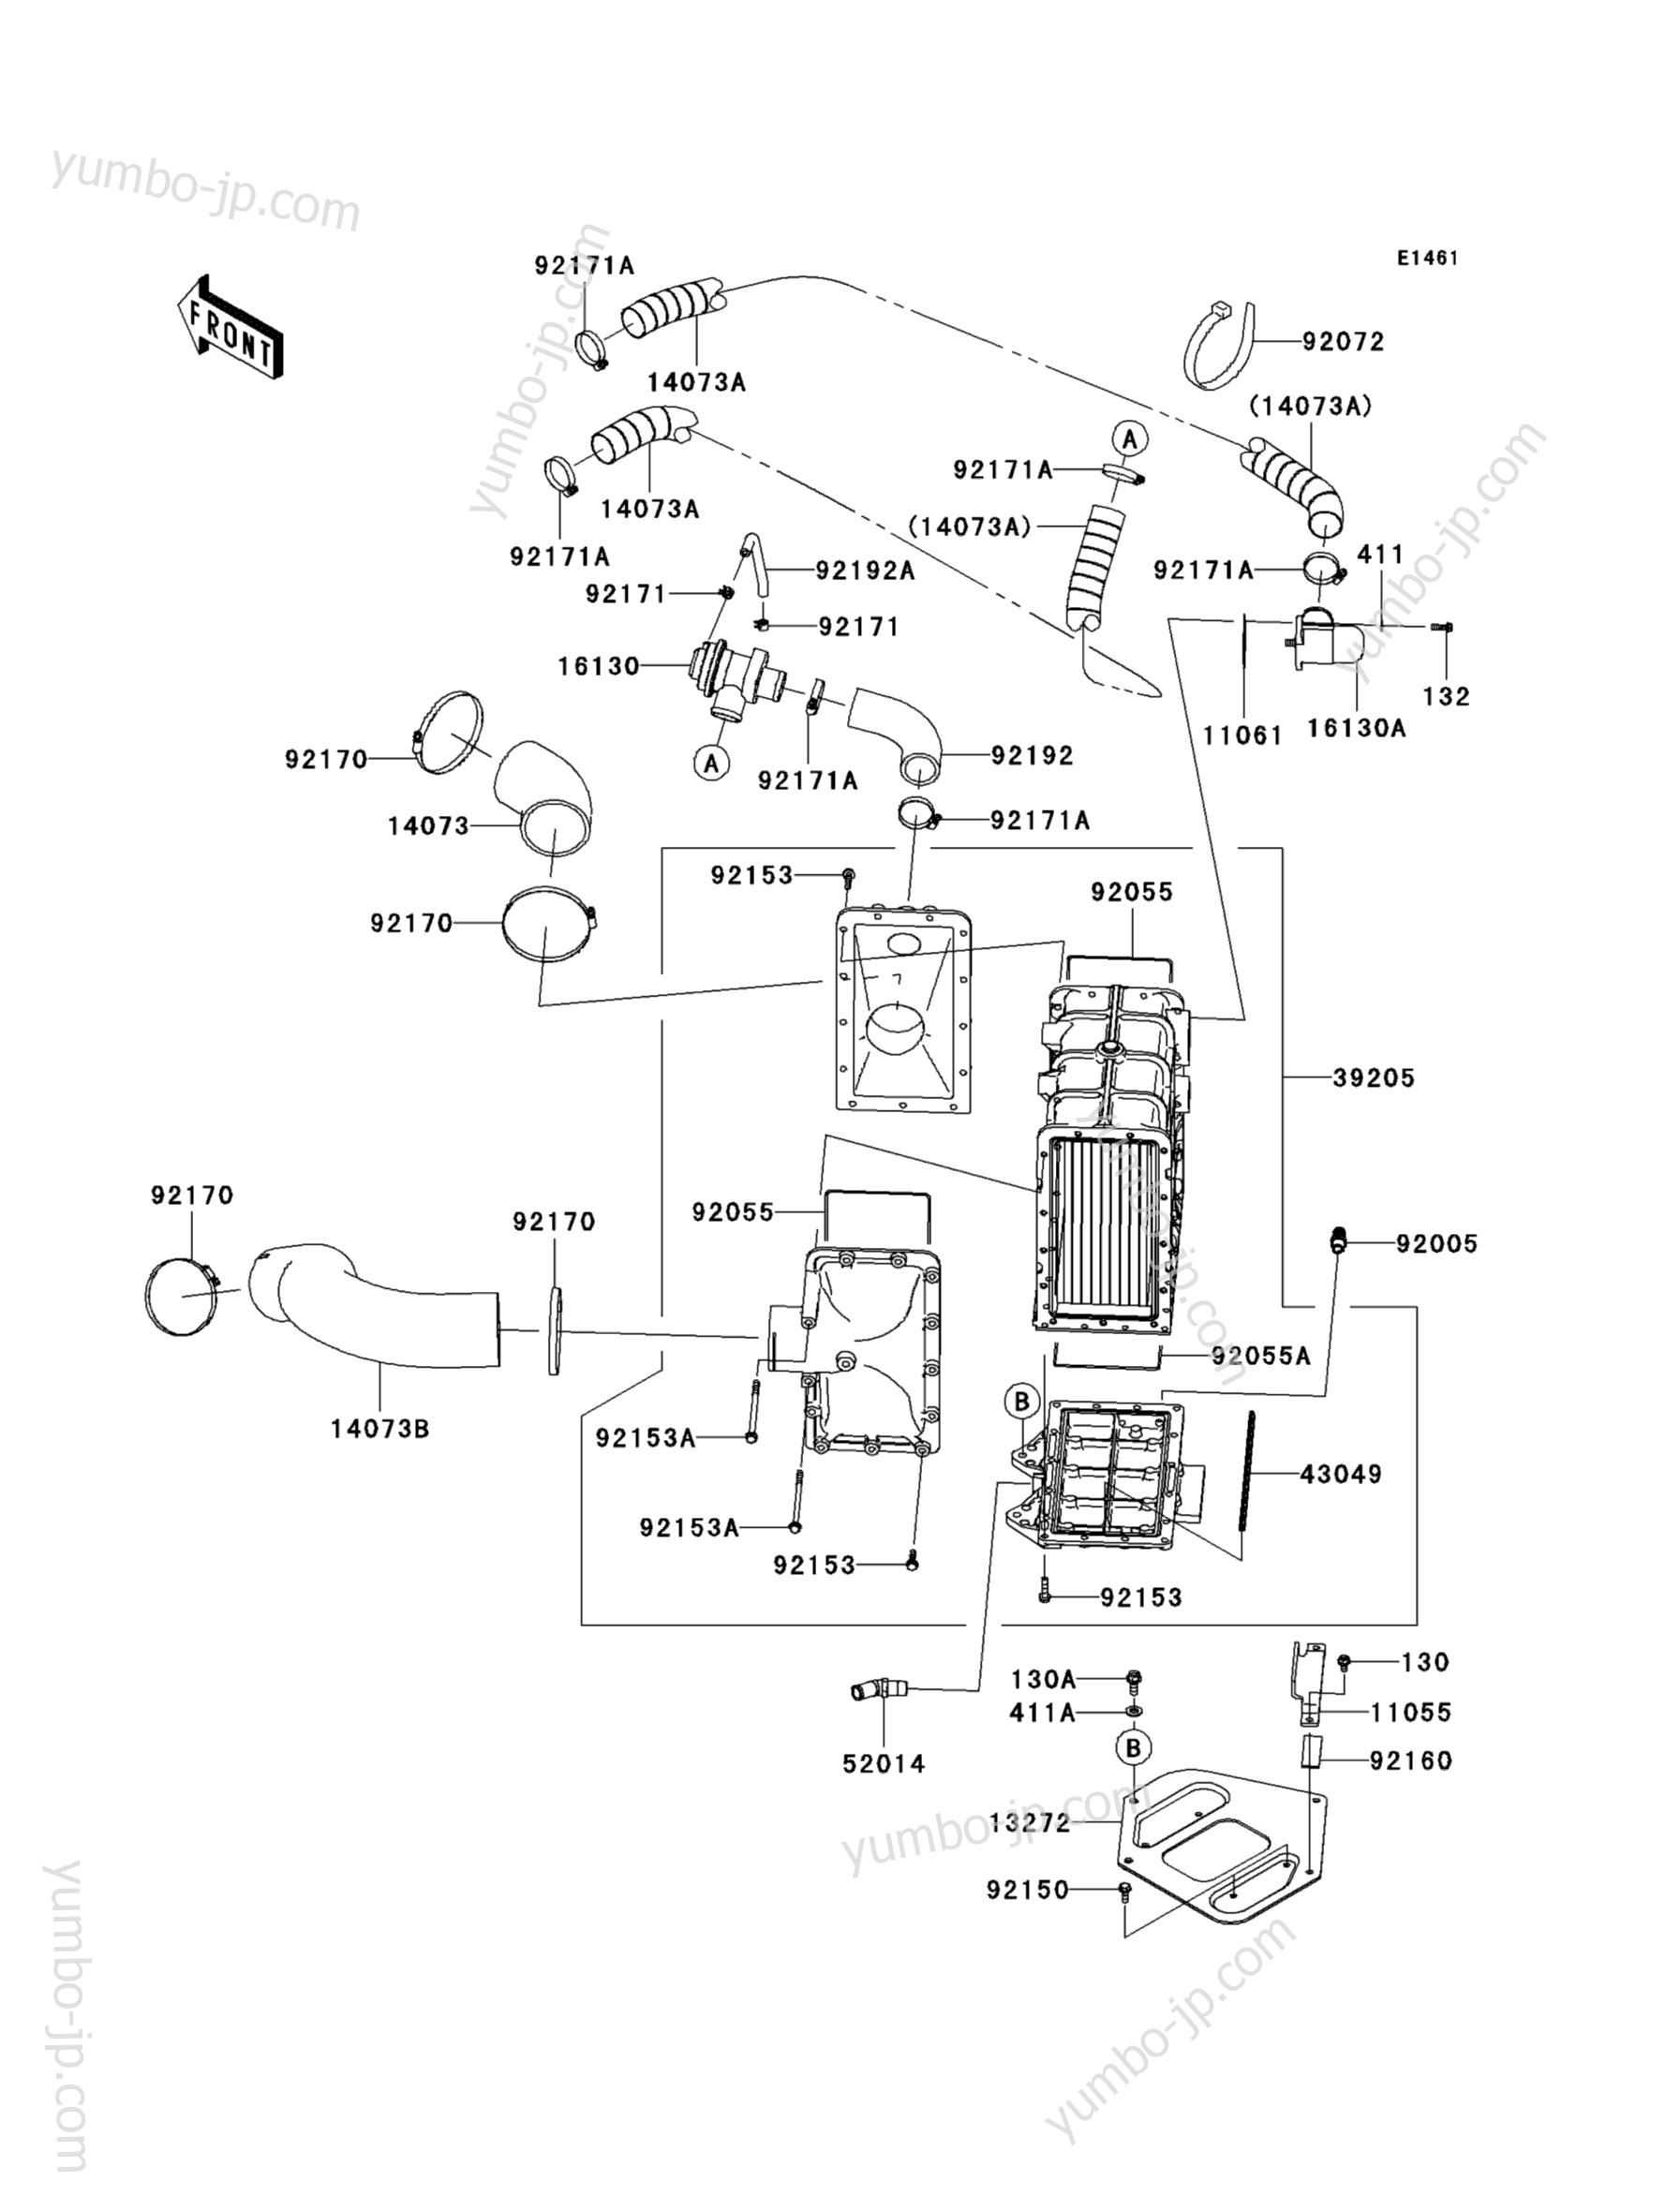 Inter Cooler для гидроциклов KAWASAKI JET SKI ULTRA 300X (JT1500HCF) 2012 г.